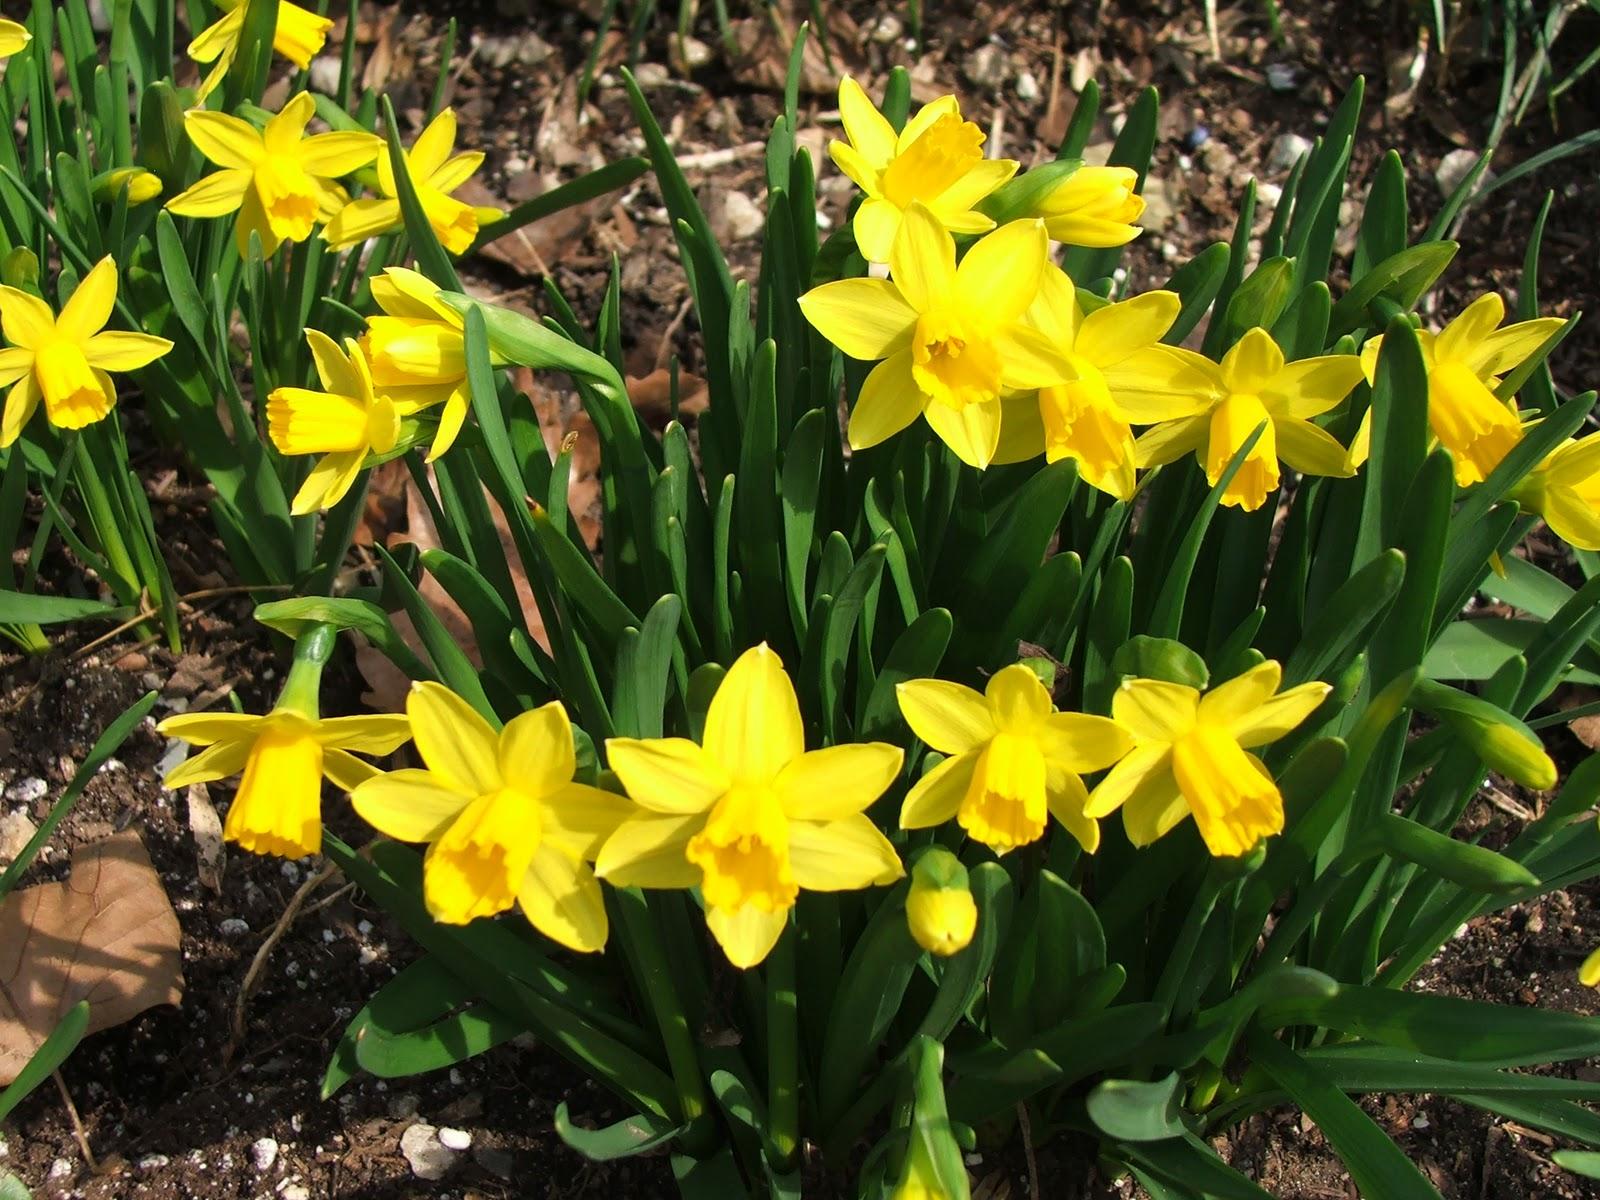 Aprilles SoCal Gardening  Plant Those Daffodil bulbs